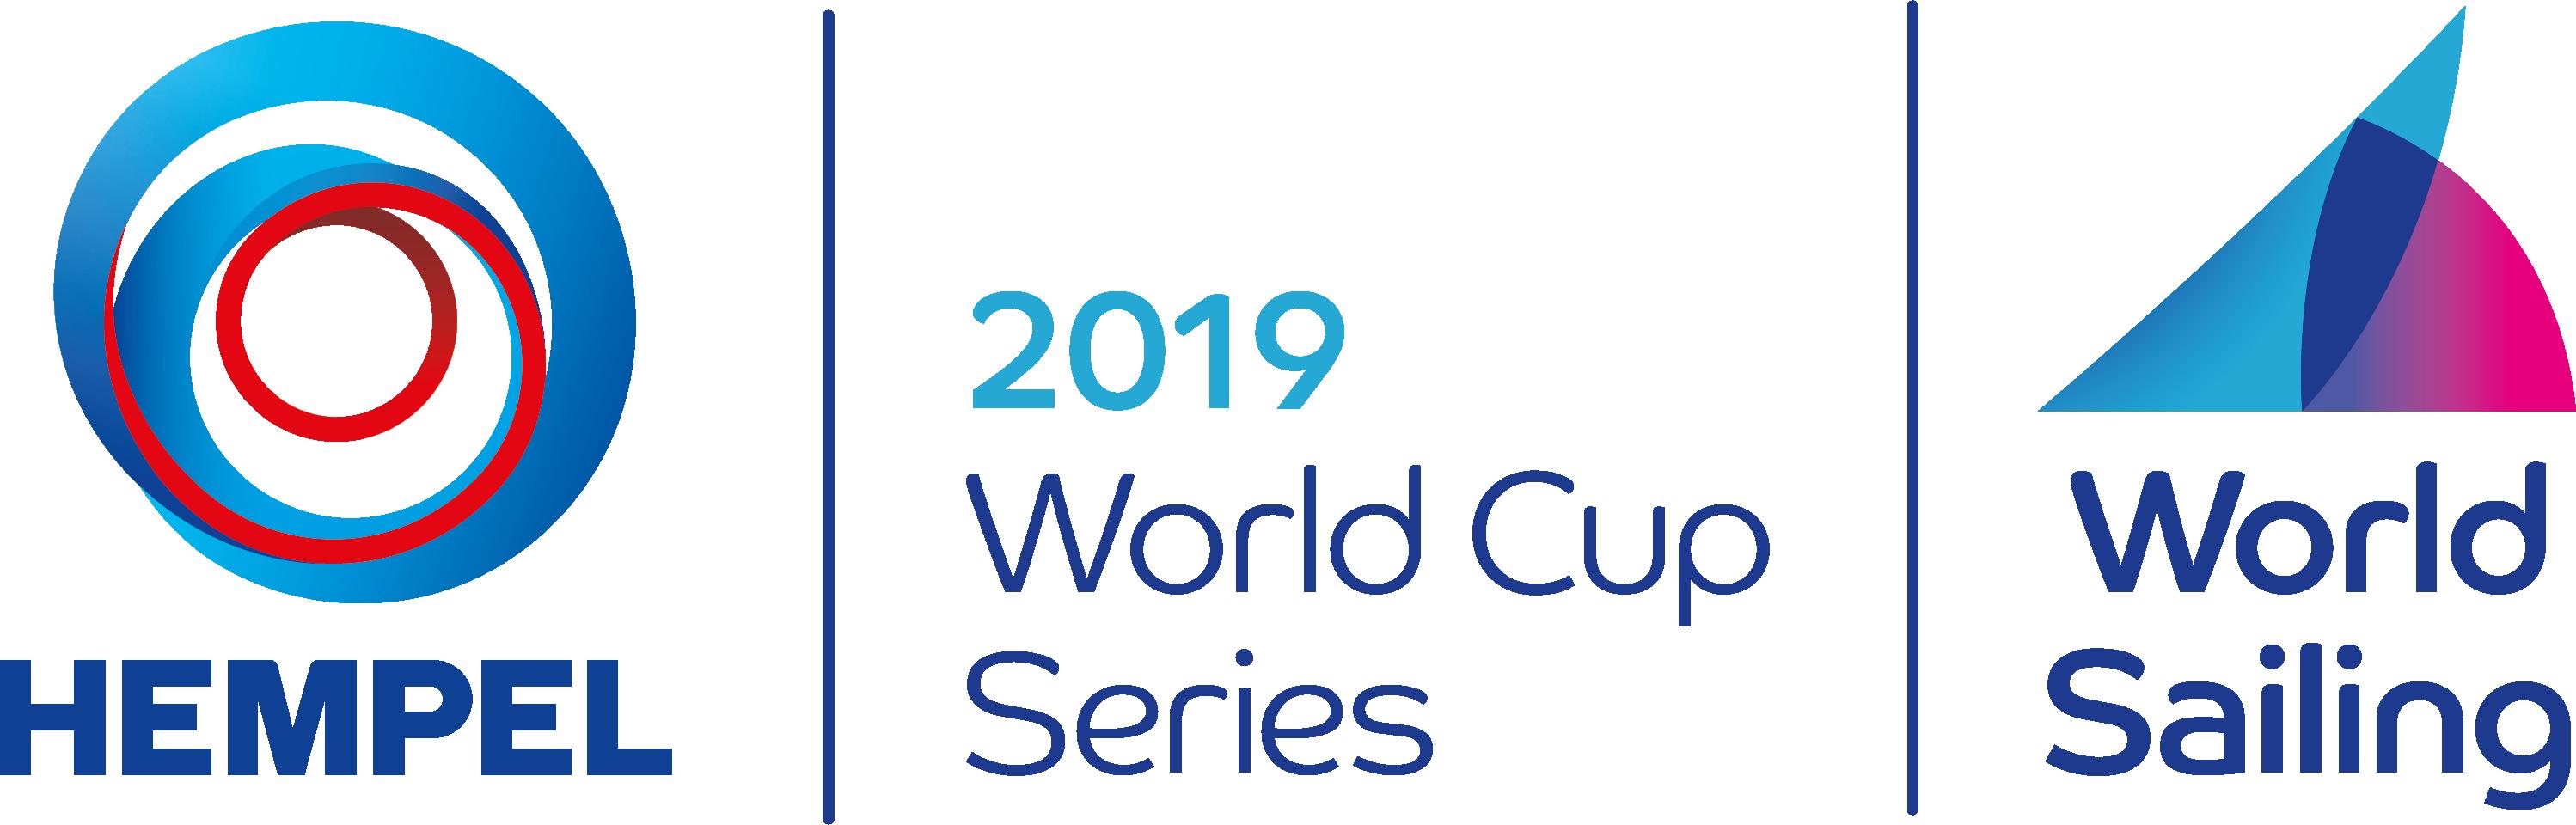 hempel - فرمولا کایت به فینال سری مسابقات جام جهانی Hempel اضافه شد